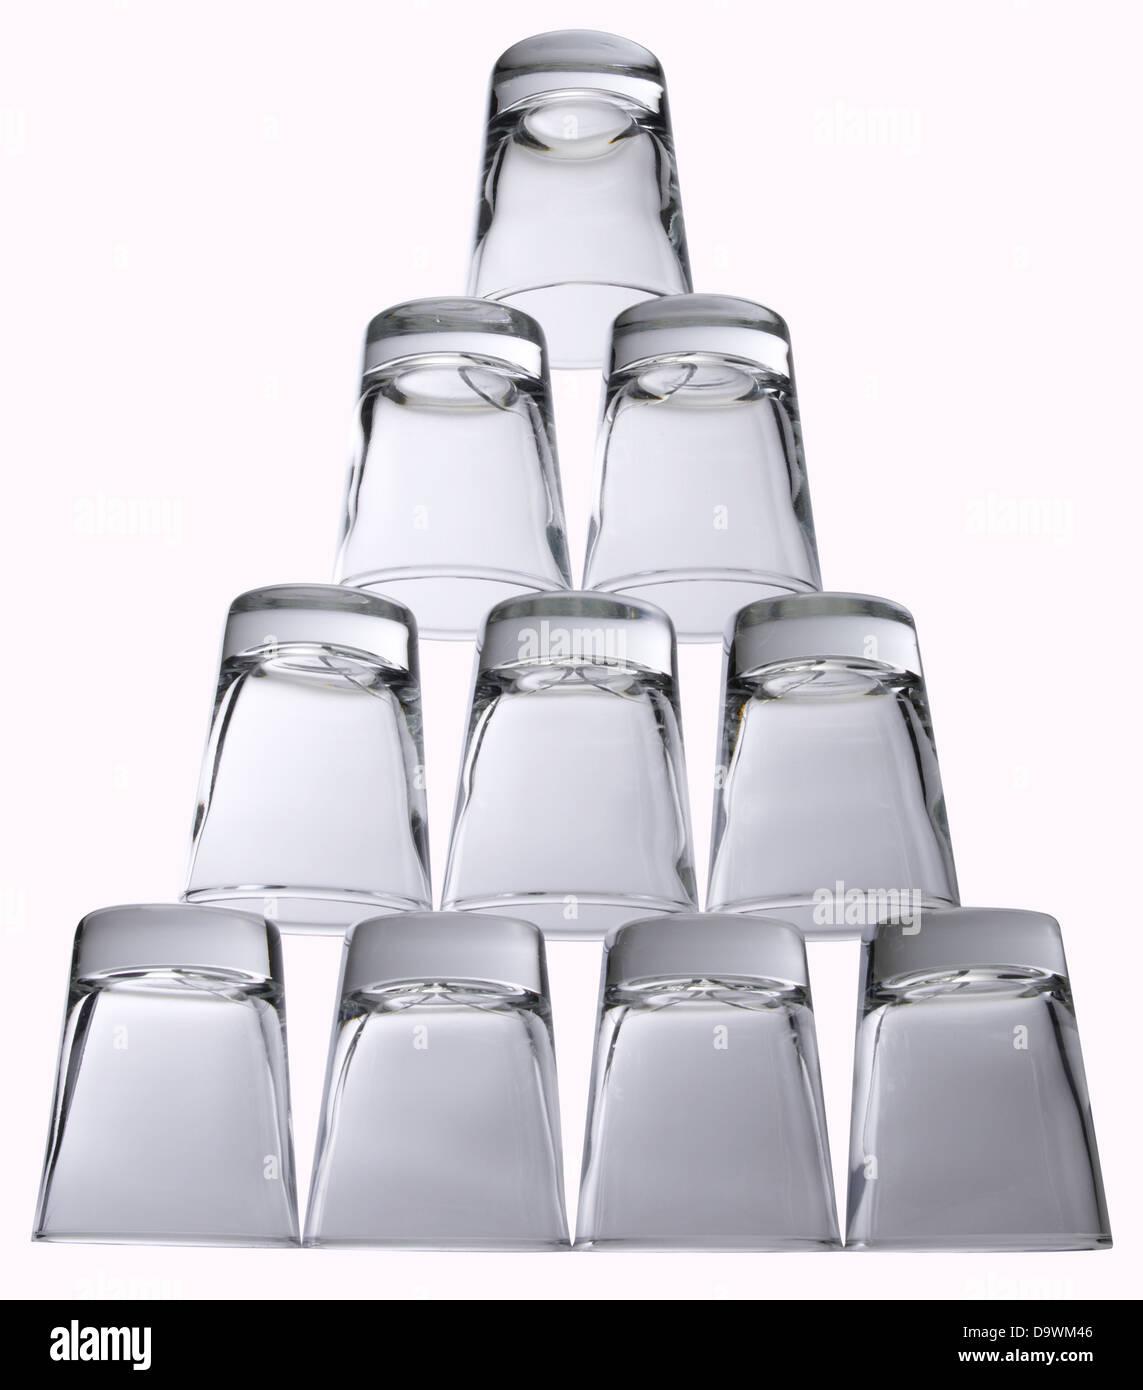 shot glasses - Stock Image